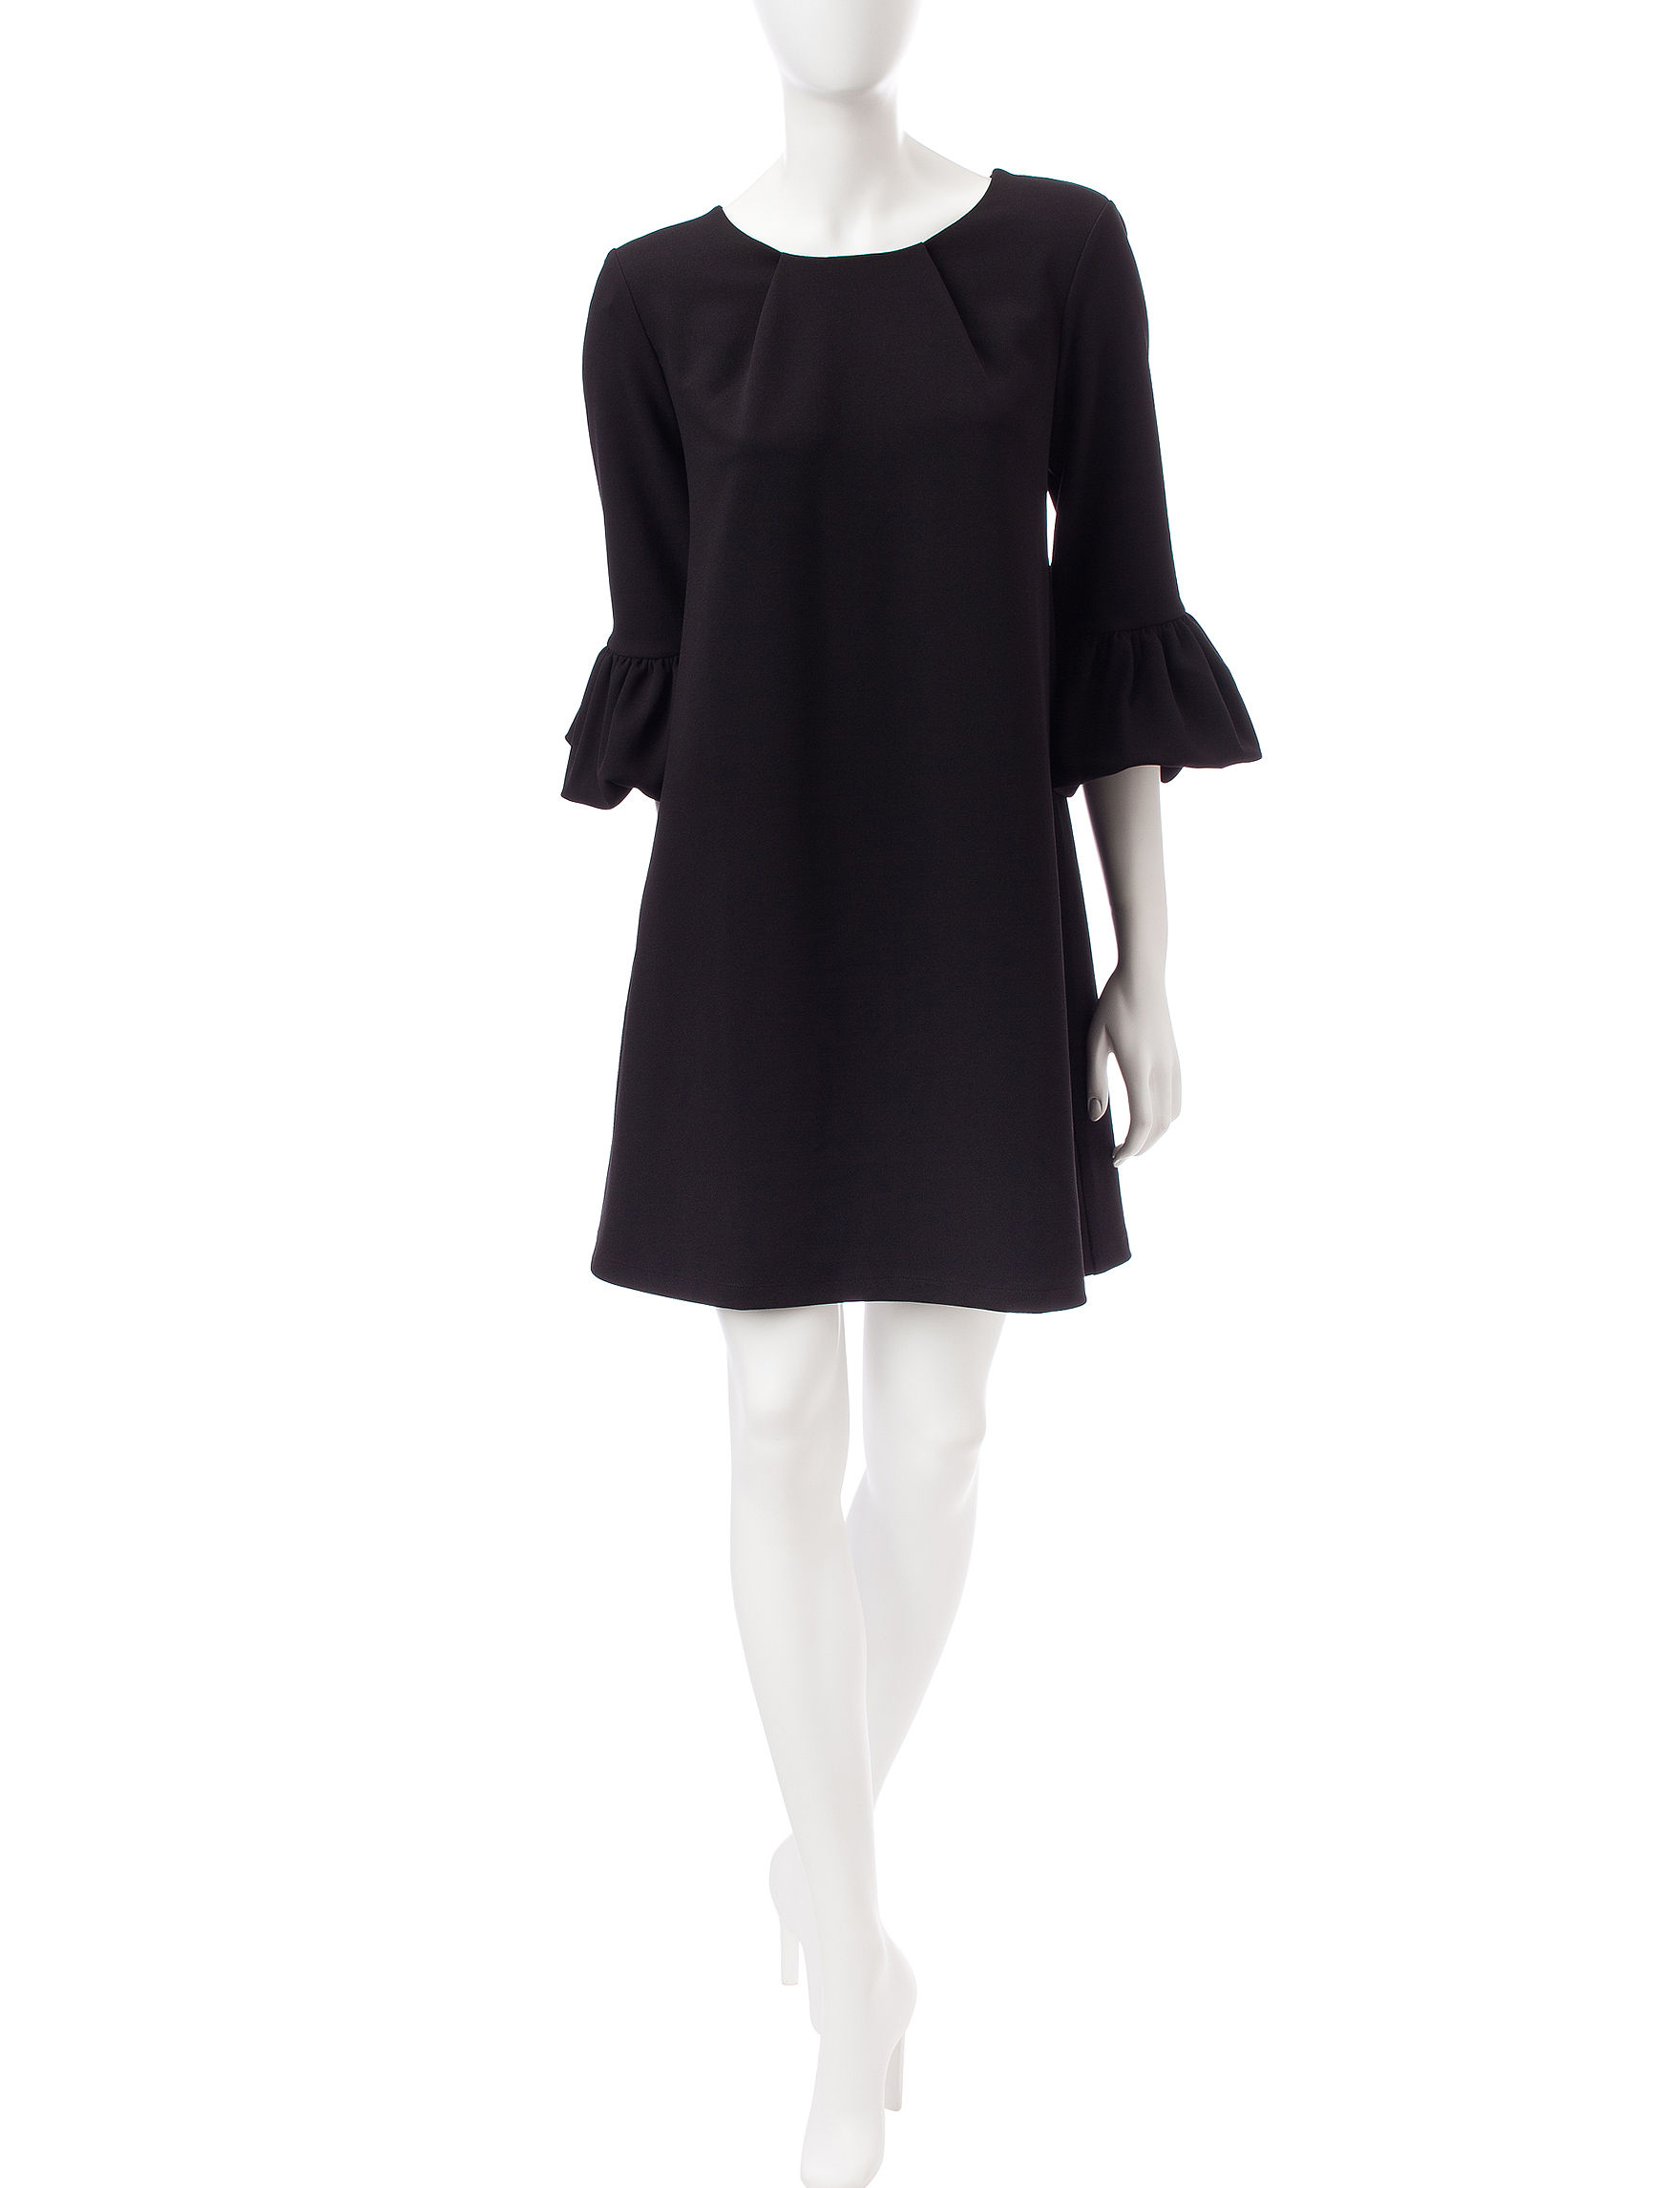 Lennie Black Cocktail & Party Evening & Formal A-line Dresses